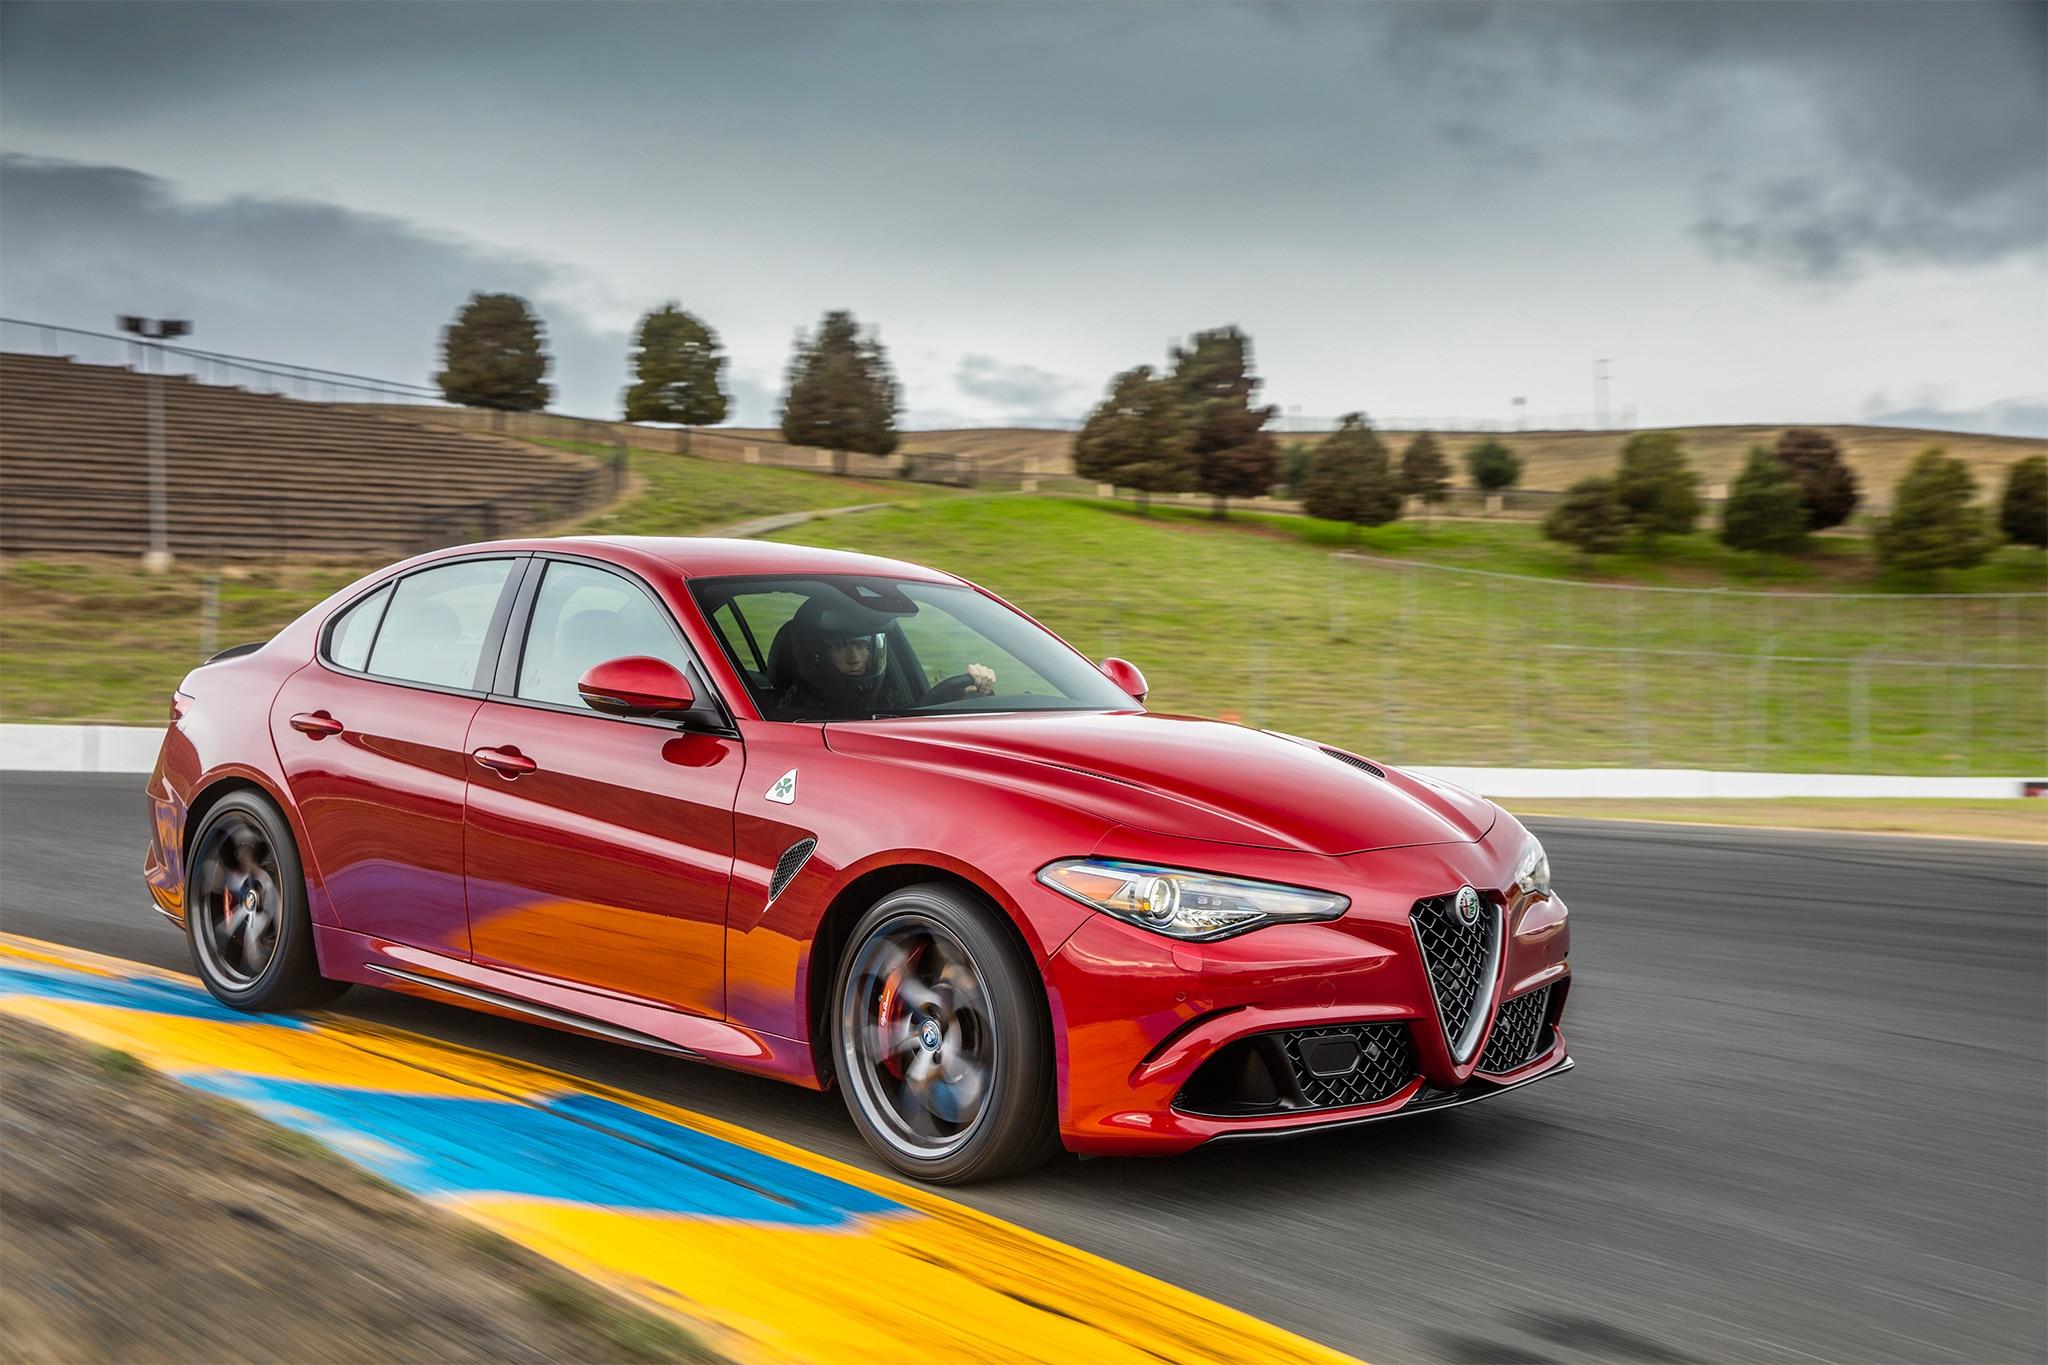 2017 Alfa Romeo Giulia Priced Bring At Least 73 595 To Grab A